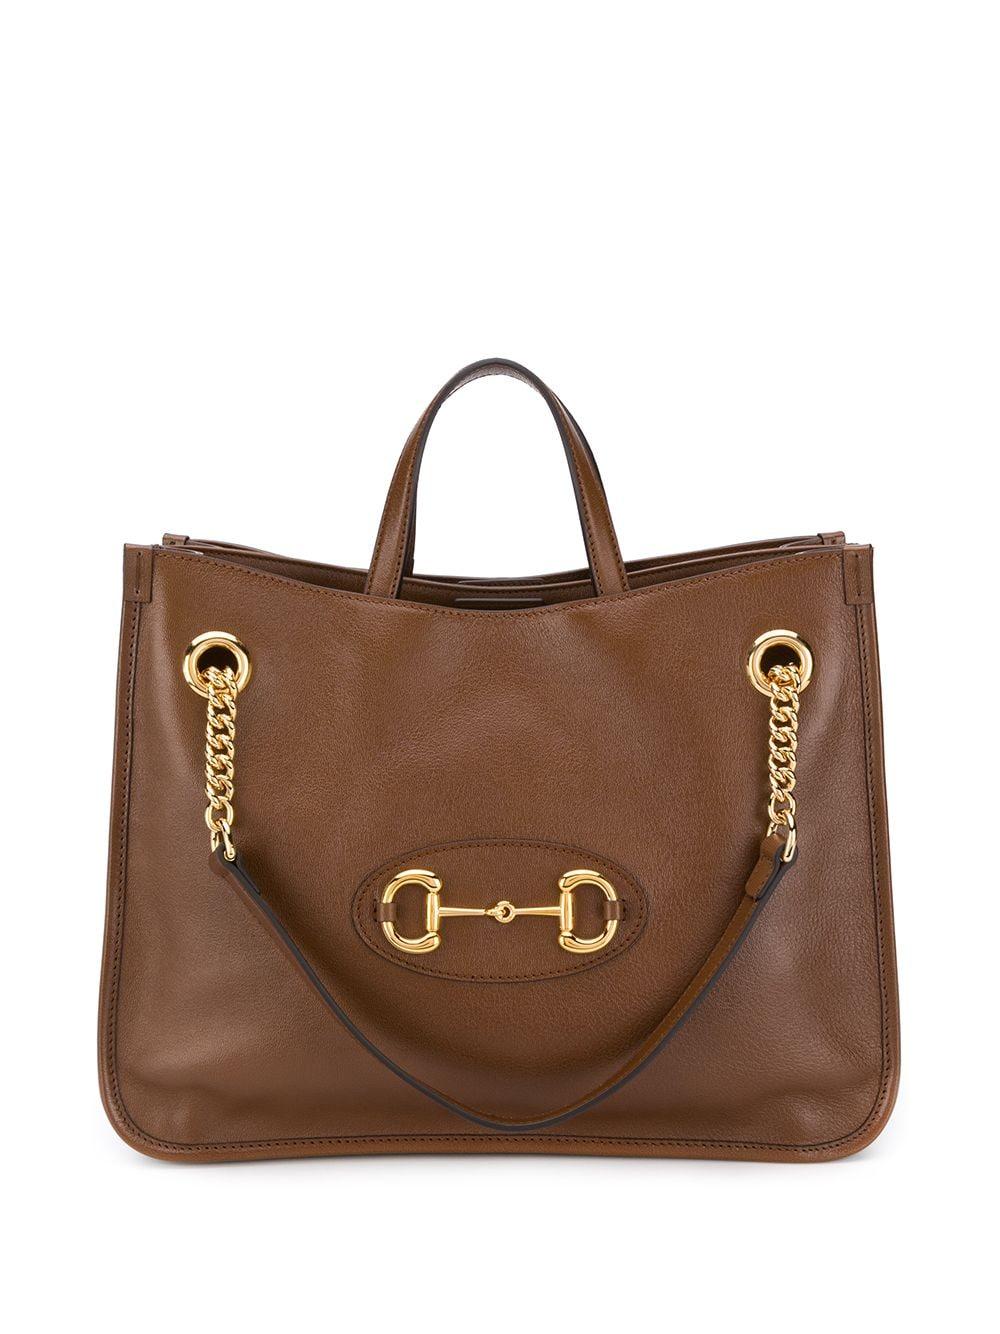 Horsebit Leather Shopping Bag